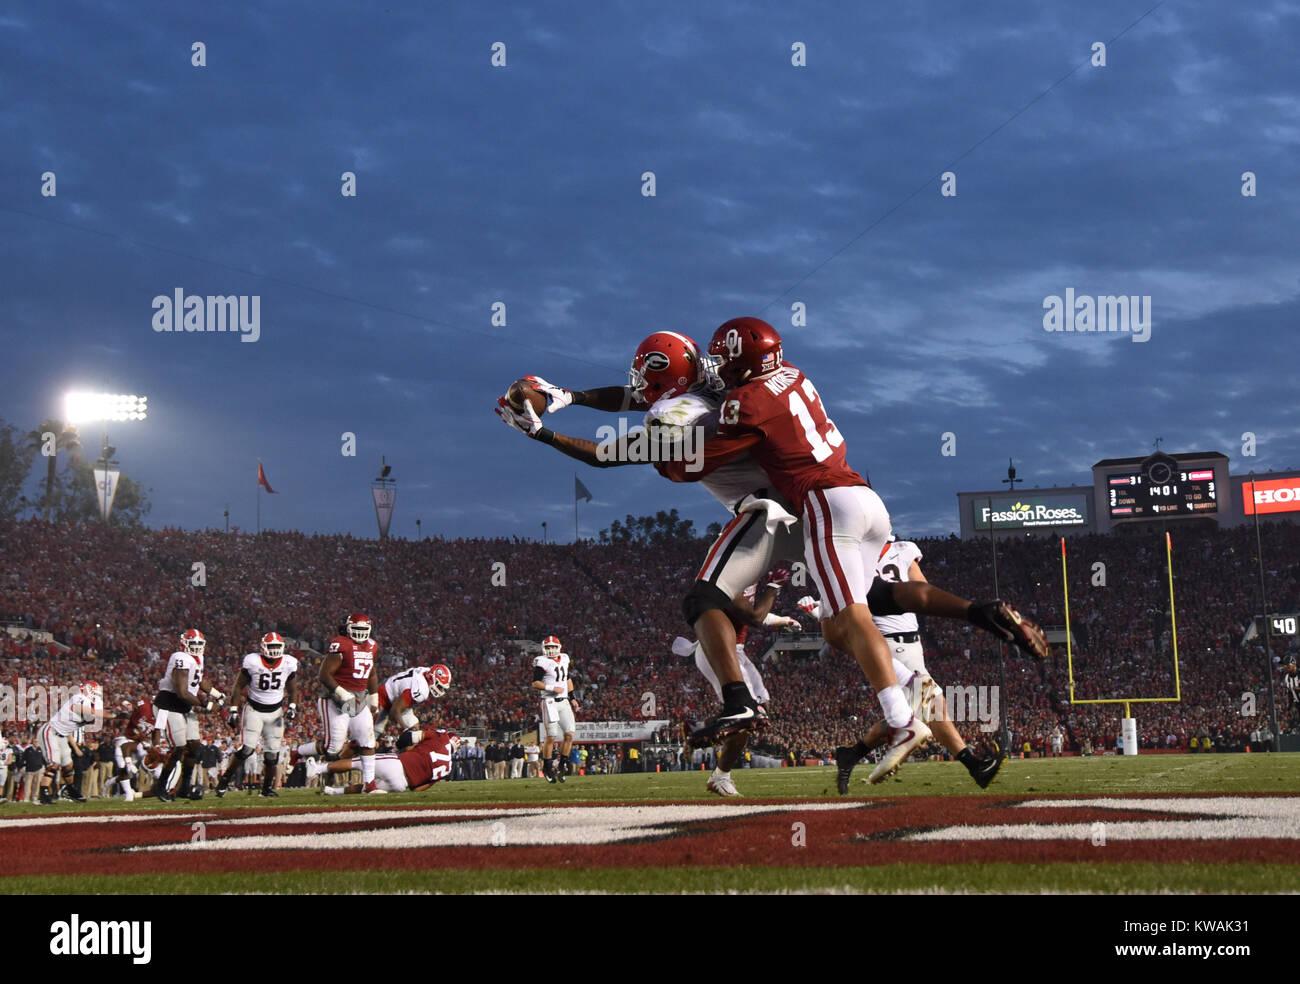 Pasadena, California, USA. 01st Jan, 2018. Georgia Bulldogs wide receiver Javon Wims #6 catches a touchdown during Stock Photo